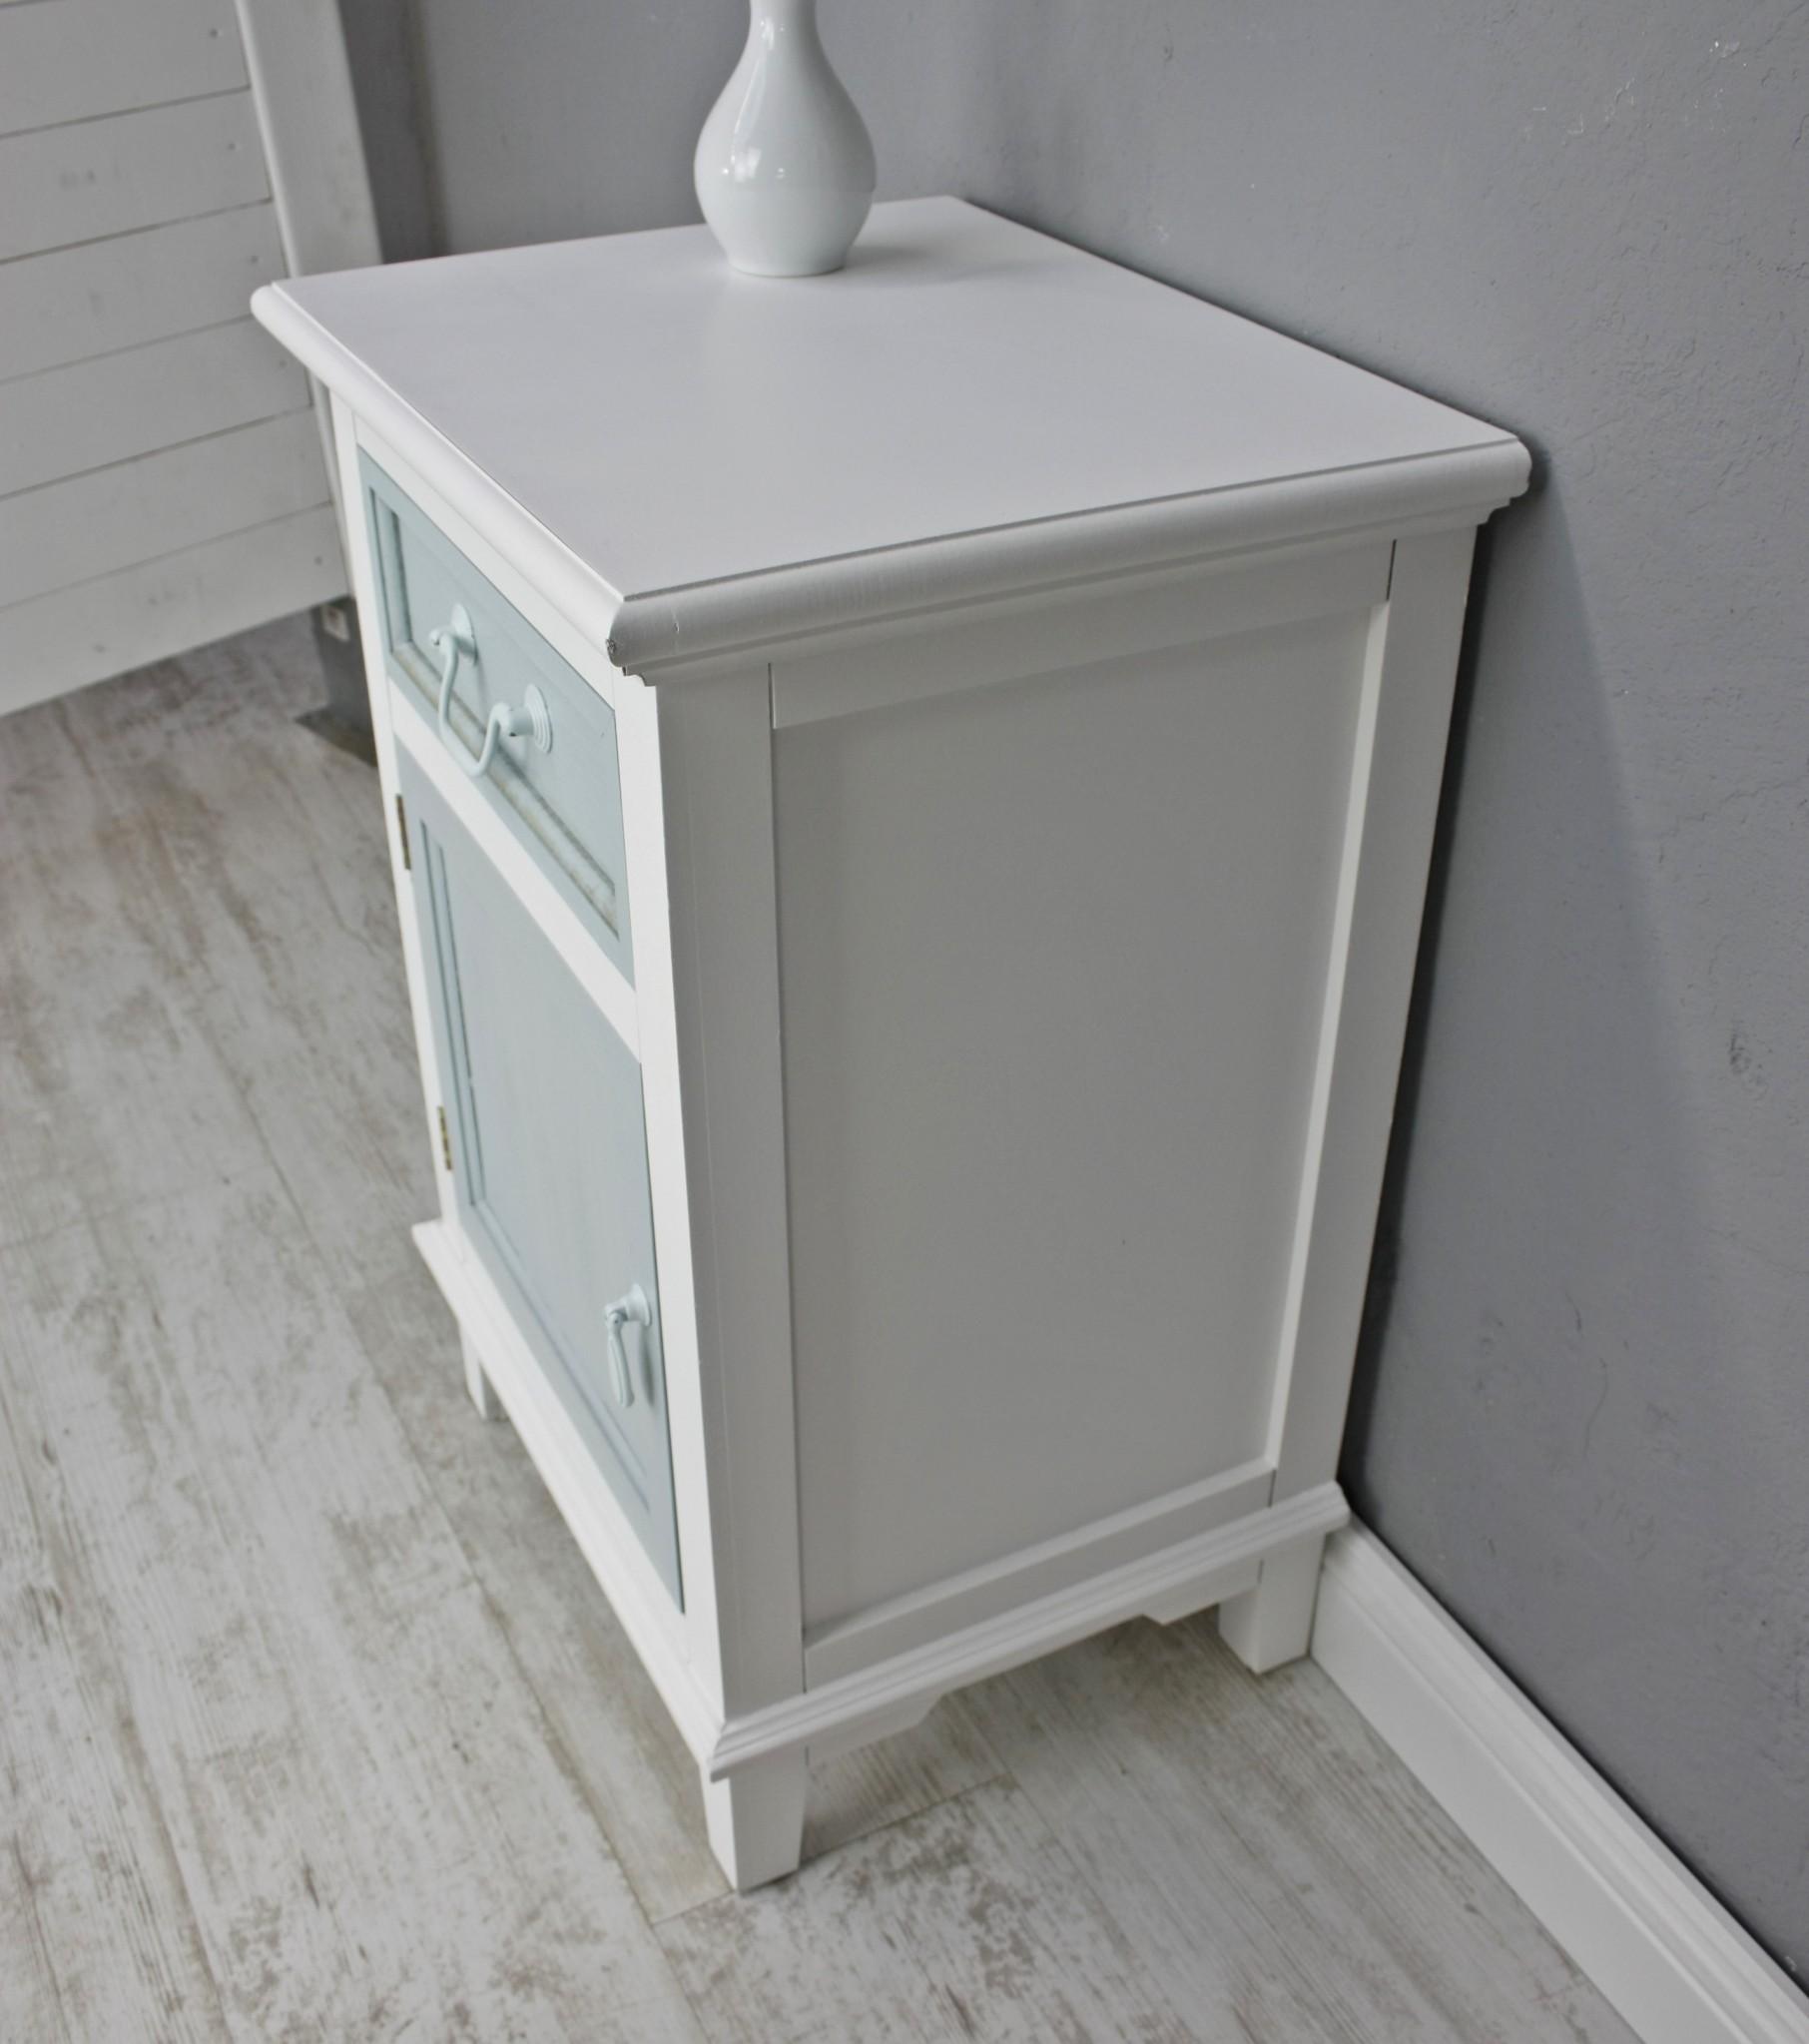 kommode schublade t r schrank wei blau antik landhaus. Black Bedroom Furniture Sets. Home Design Ideas